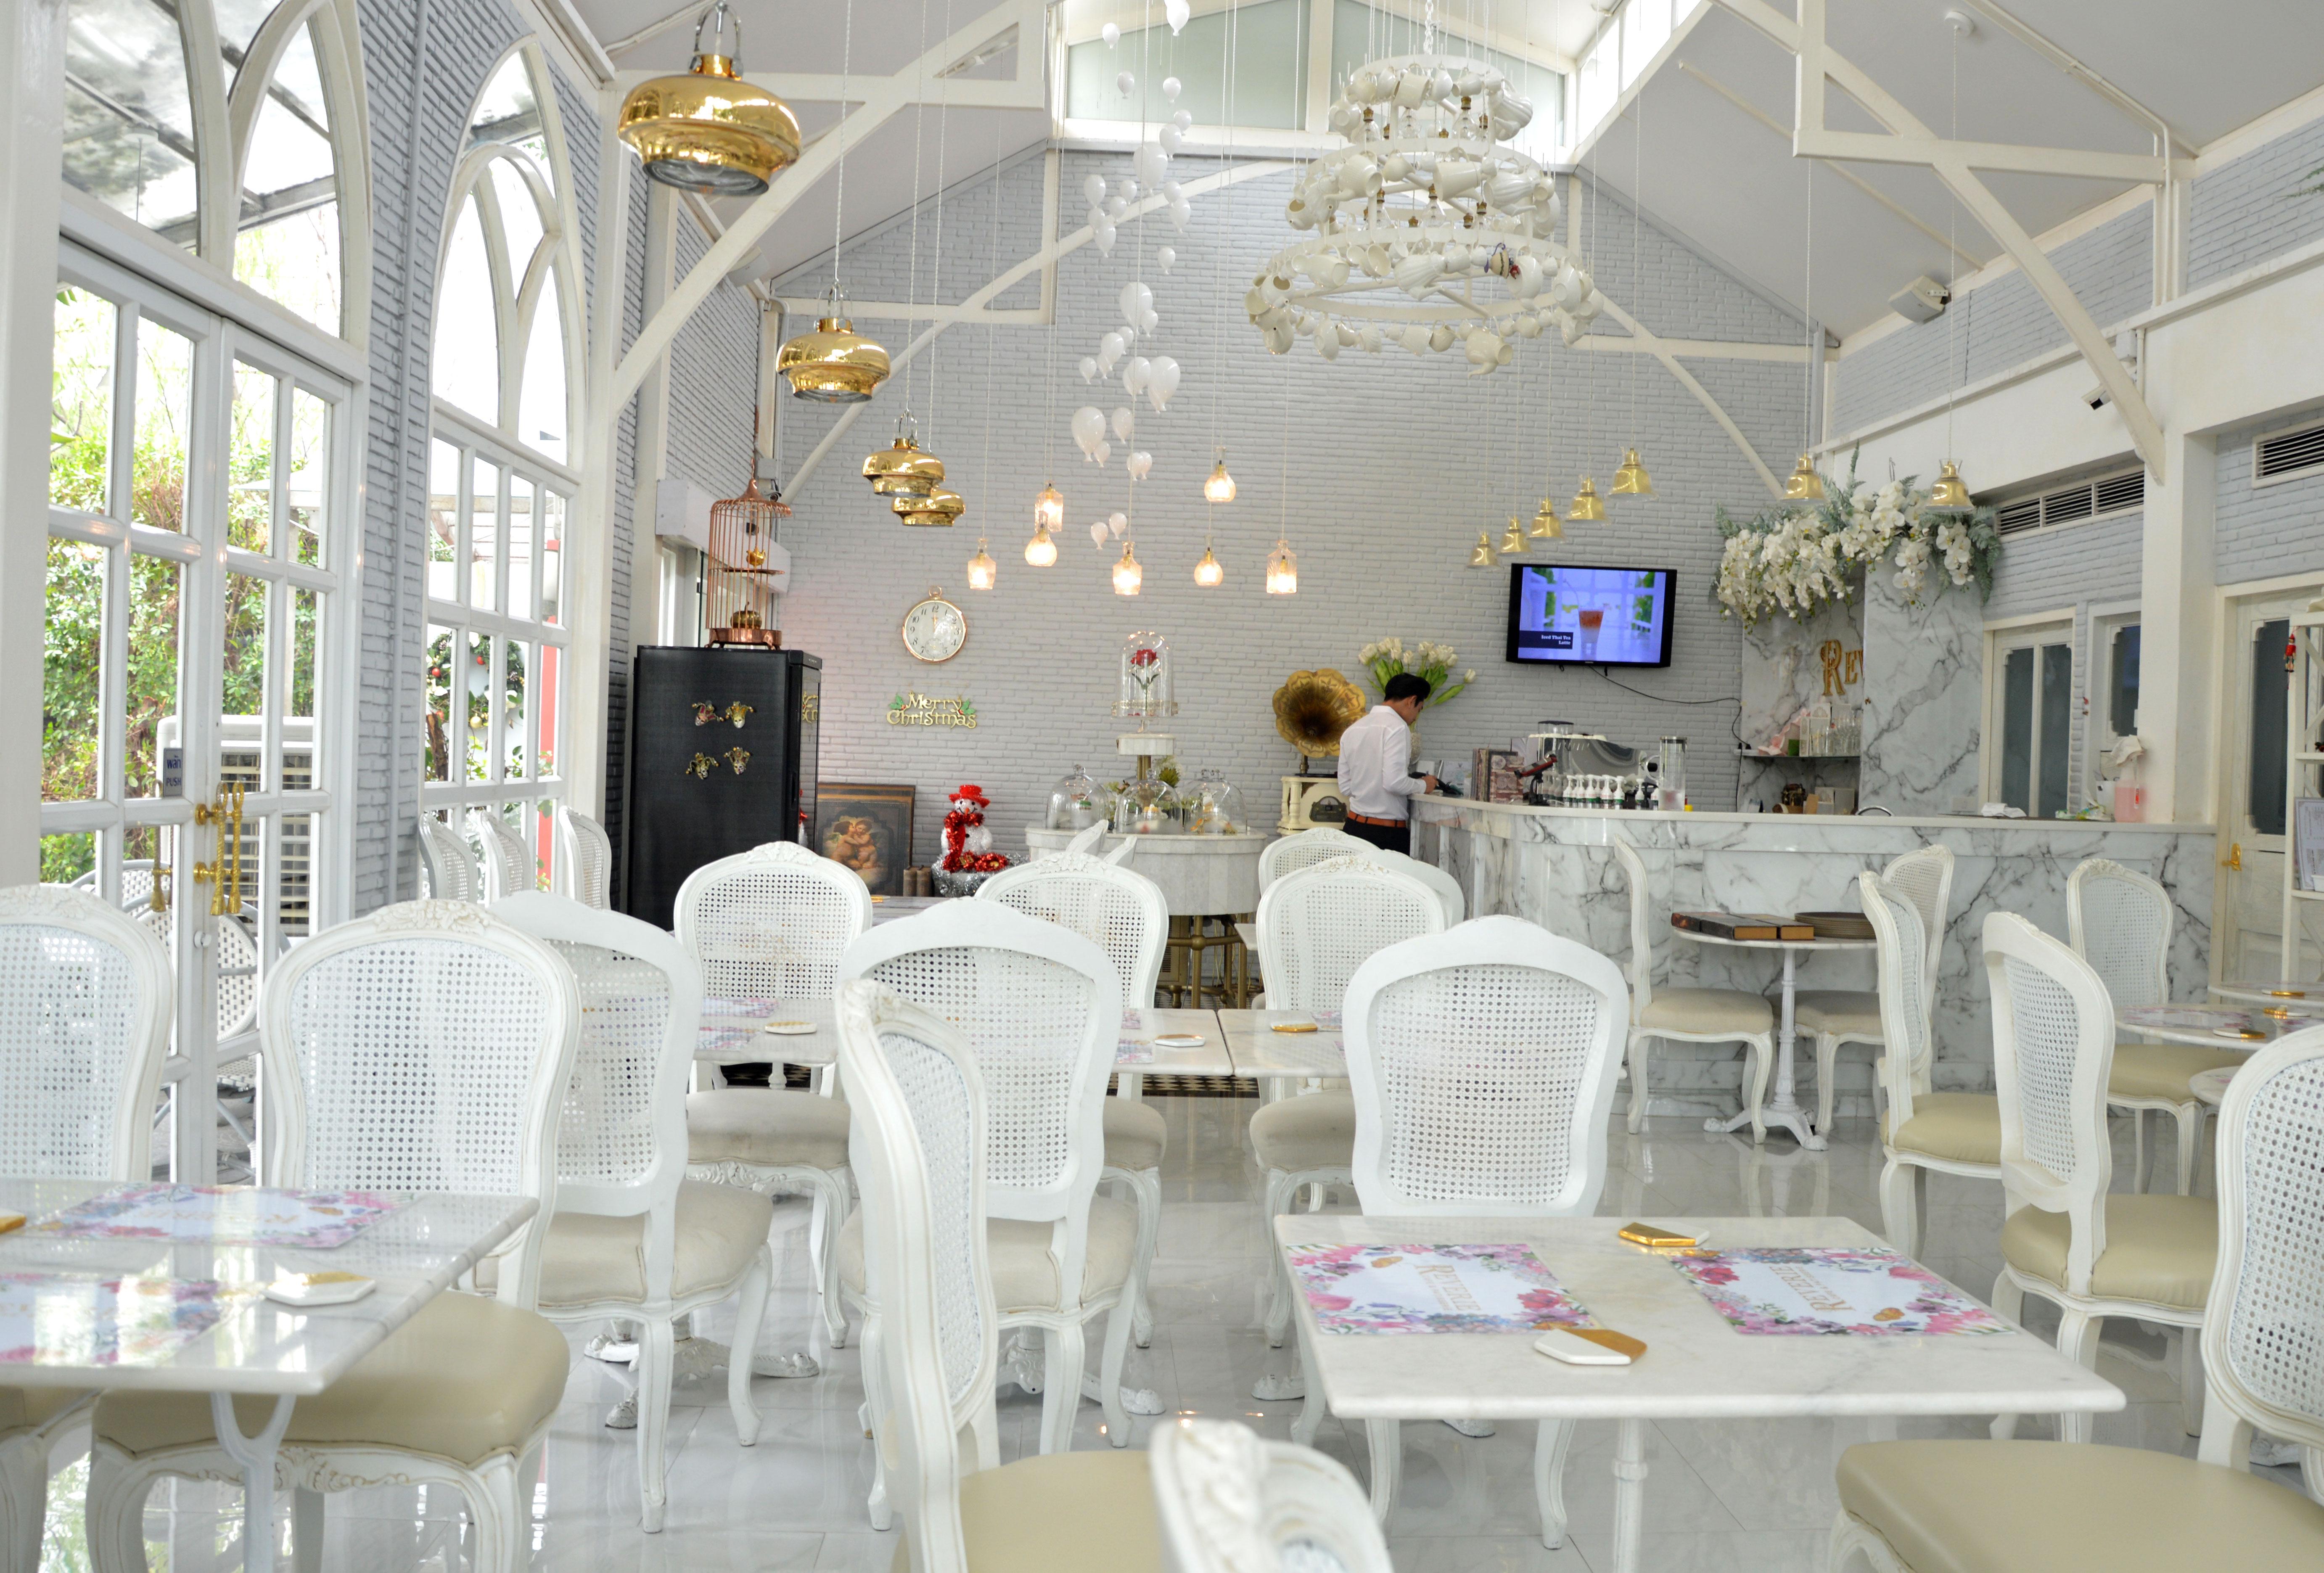 Bangkok-Tipps für Skeptiker | Café Reverie | www.dearlicious.com | Dear Nitjakan Bunbuamas